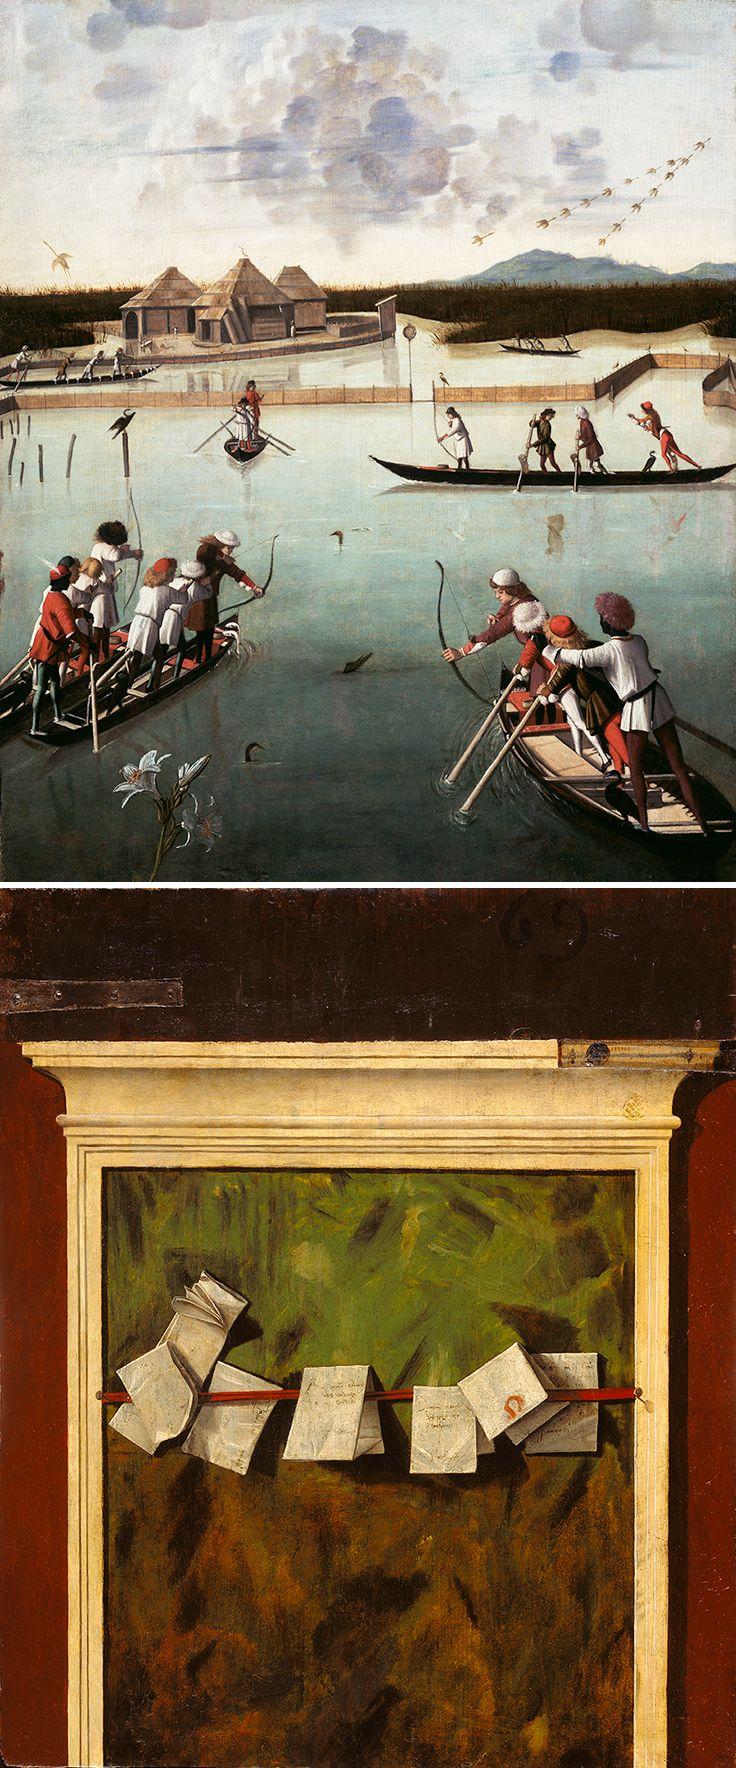 Hunting on the Lagoon (recto), Letter Rack (verso), Vittore Carpaccio, 1490-95